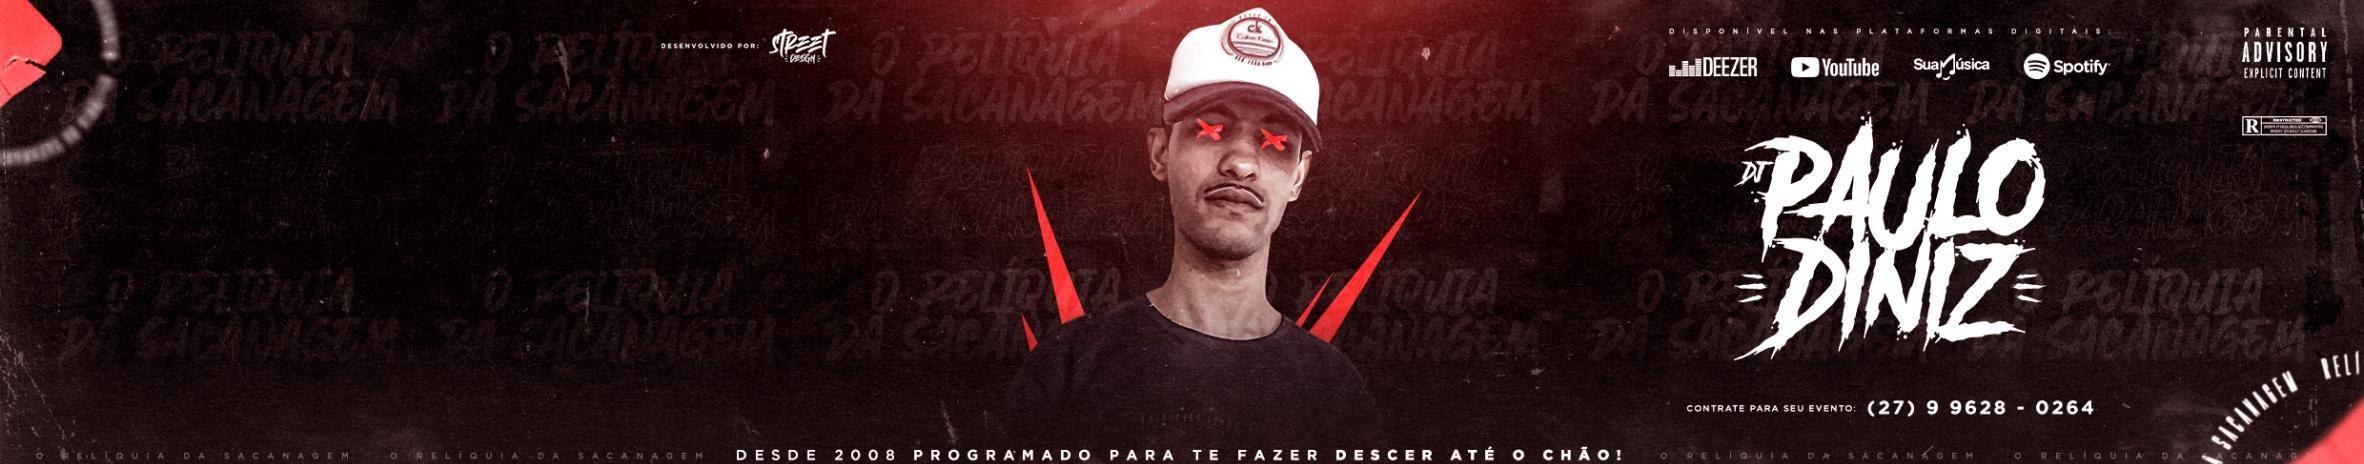 Imagem de capa de DJ Paulo Diniz